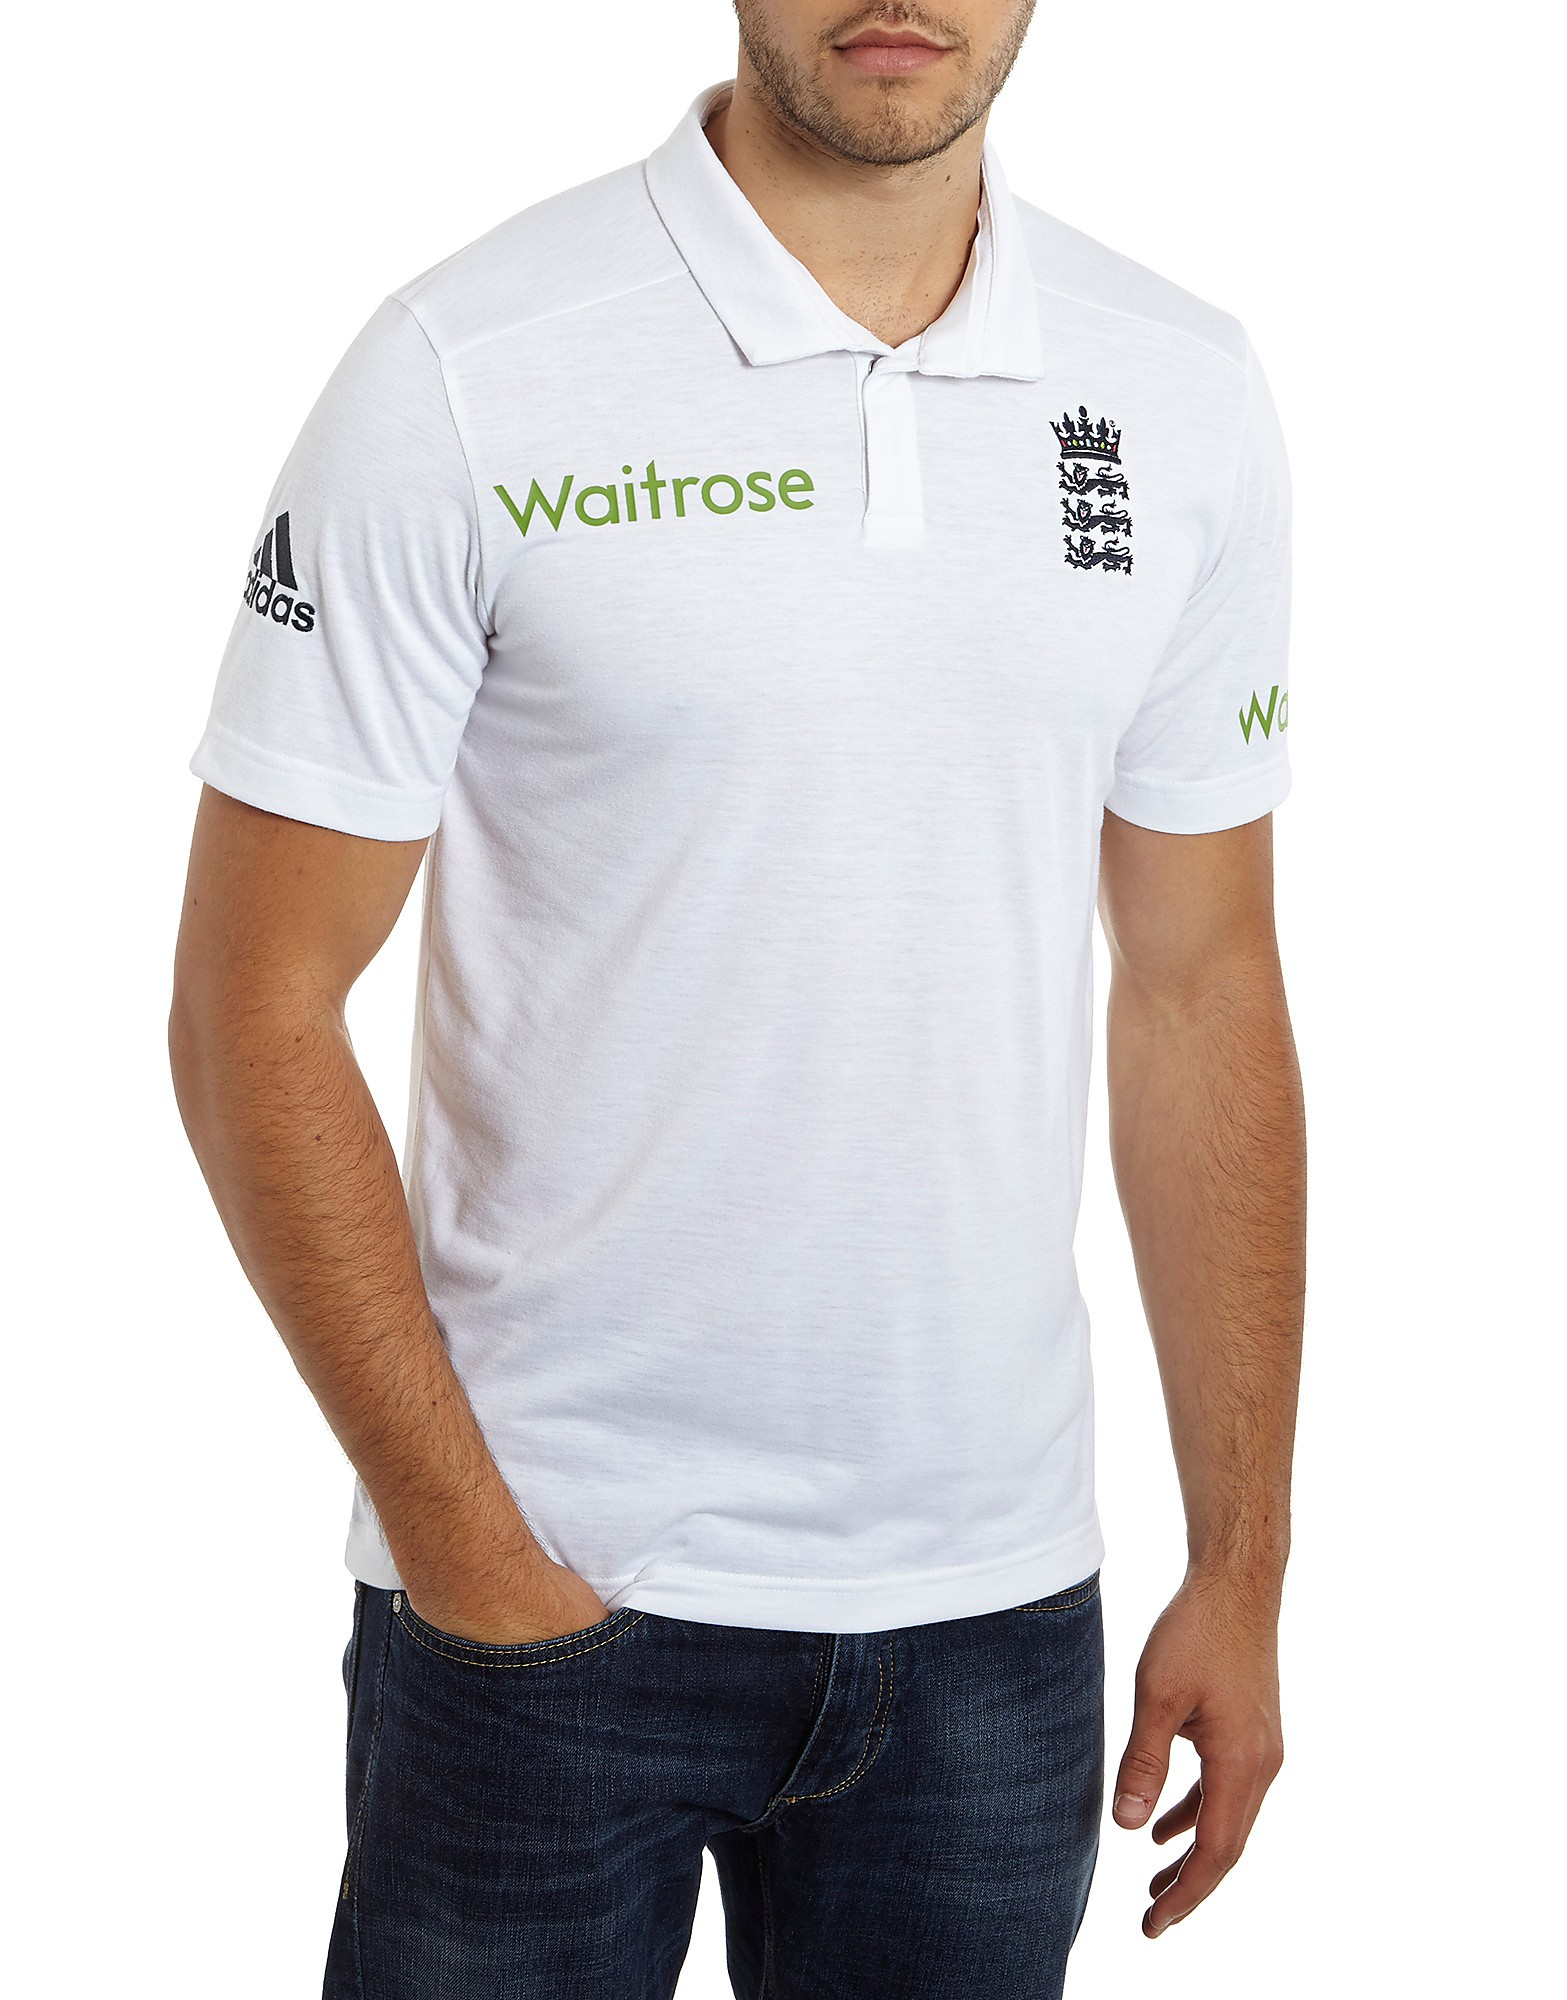 Buy cheap England cricket shirt